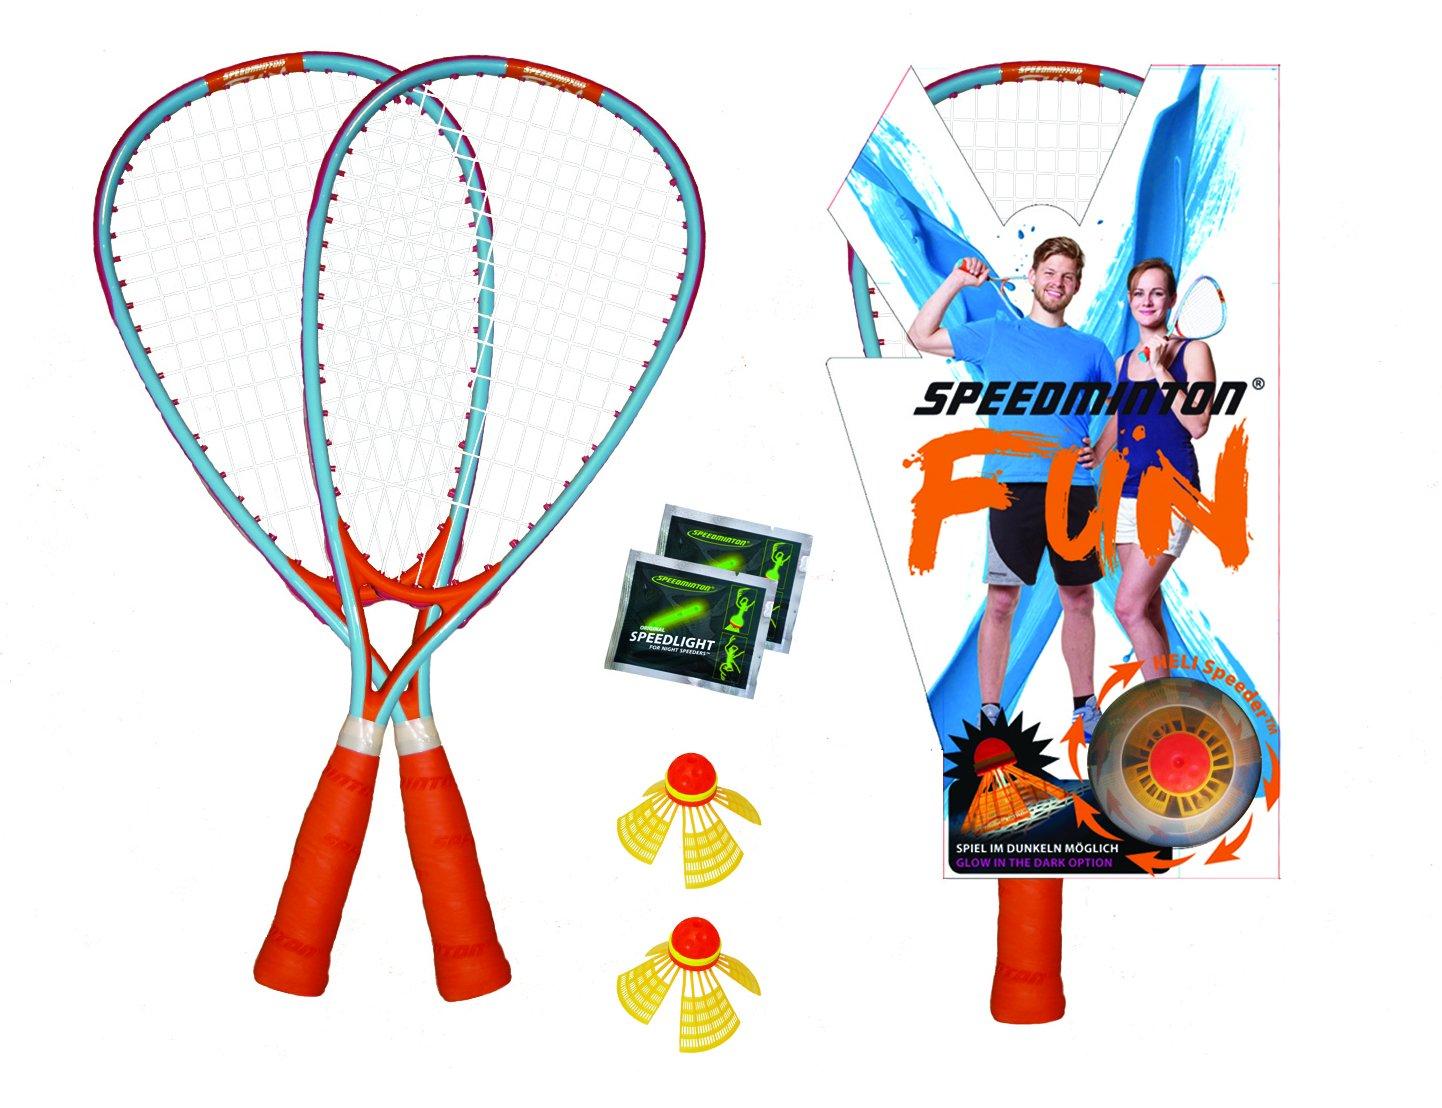 Speedminton SM01-FUN-10 FUN Set - Alternative to beach ball, spike ball, badminton, incl. 1 HELI and one FUN Speeder, perfect for the beach, park or backyard